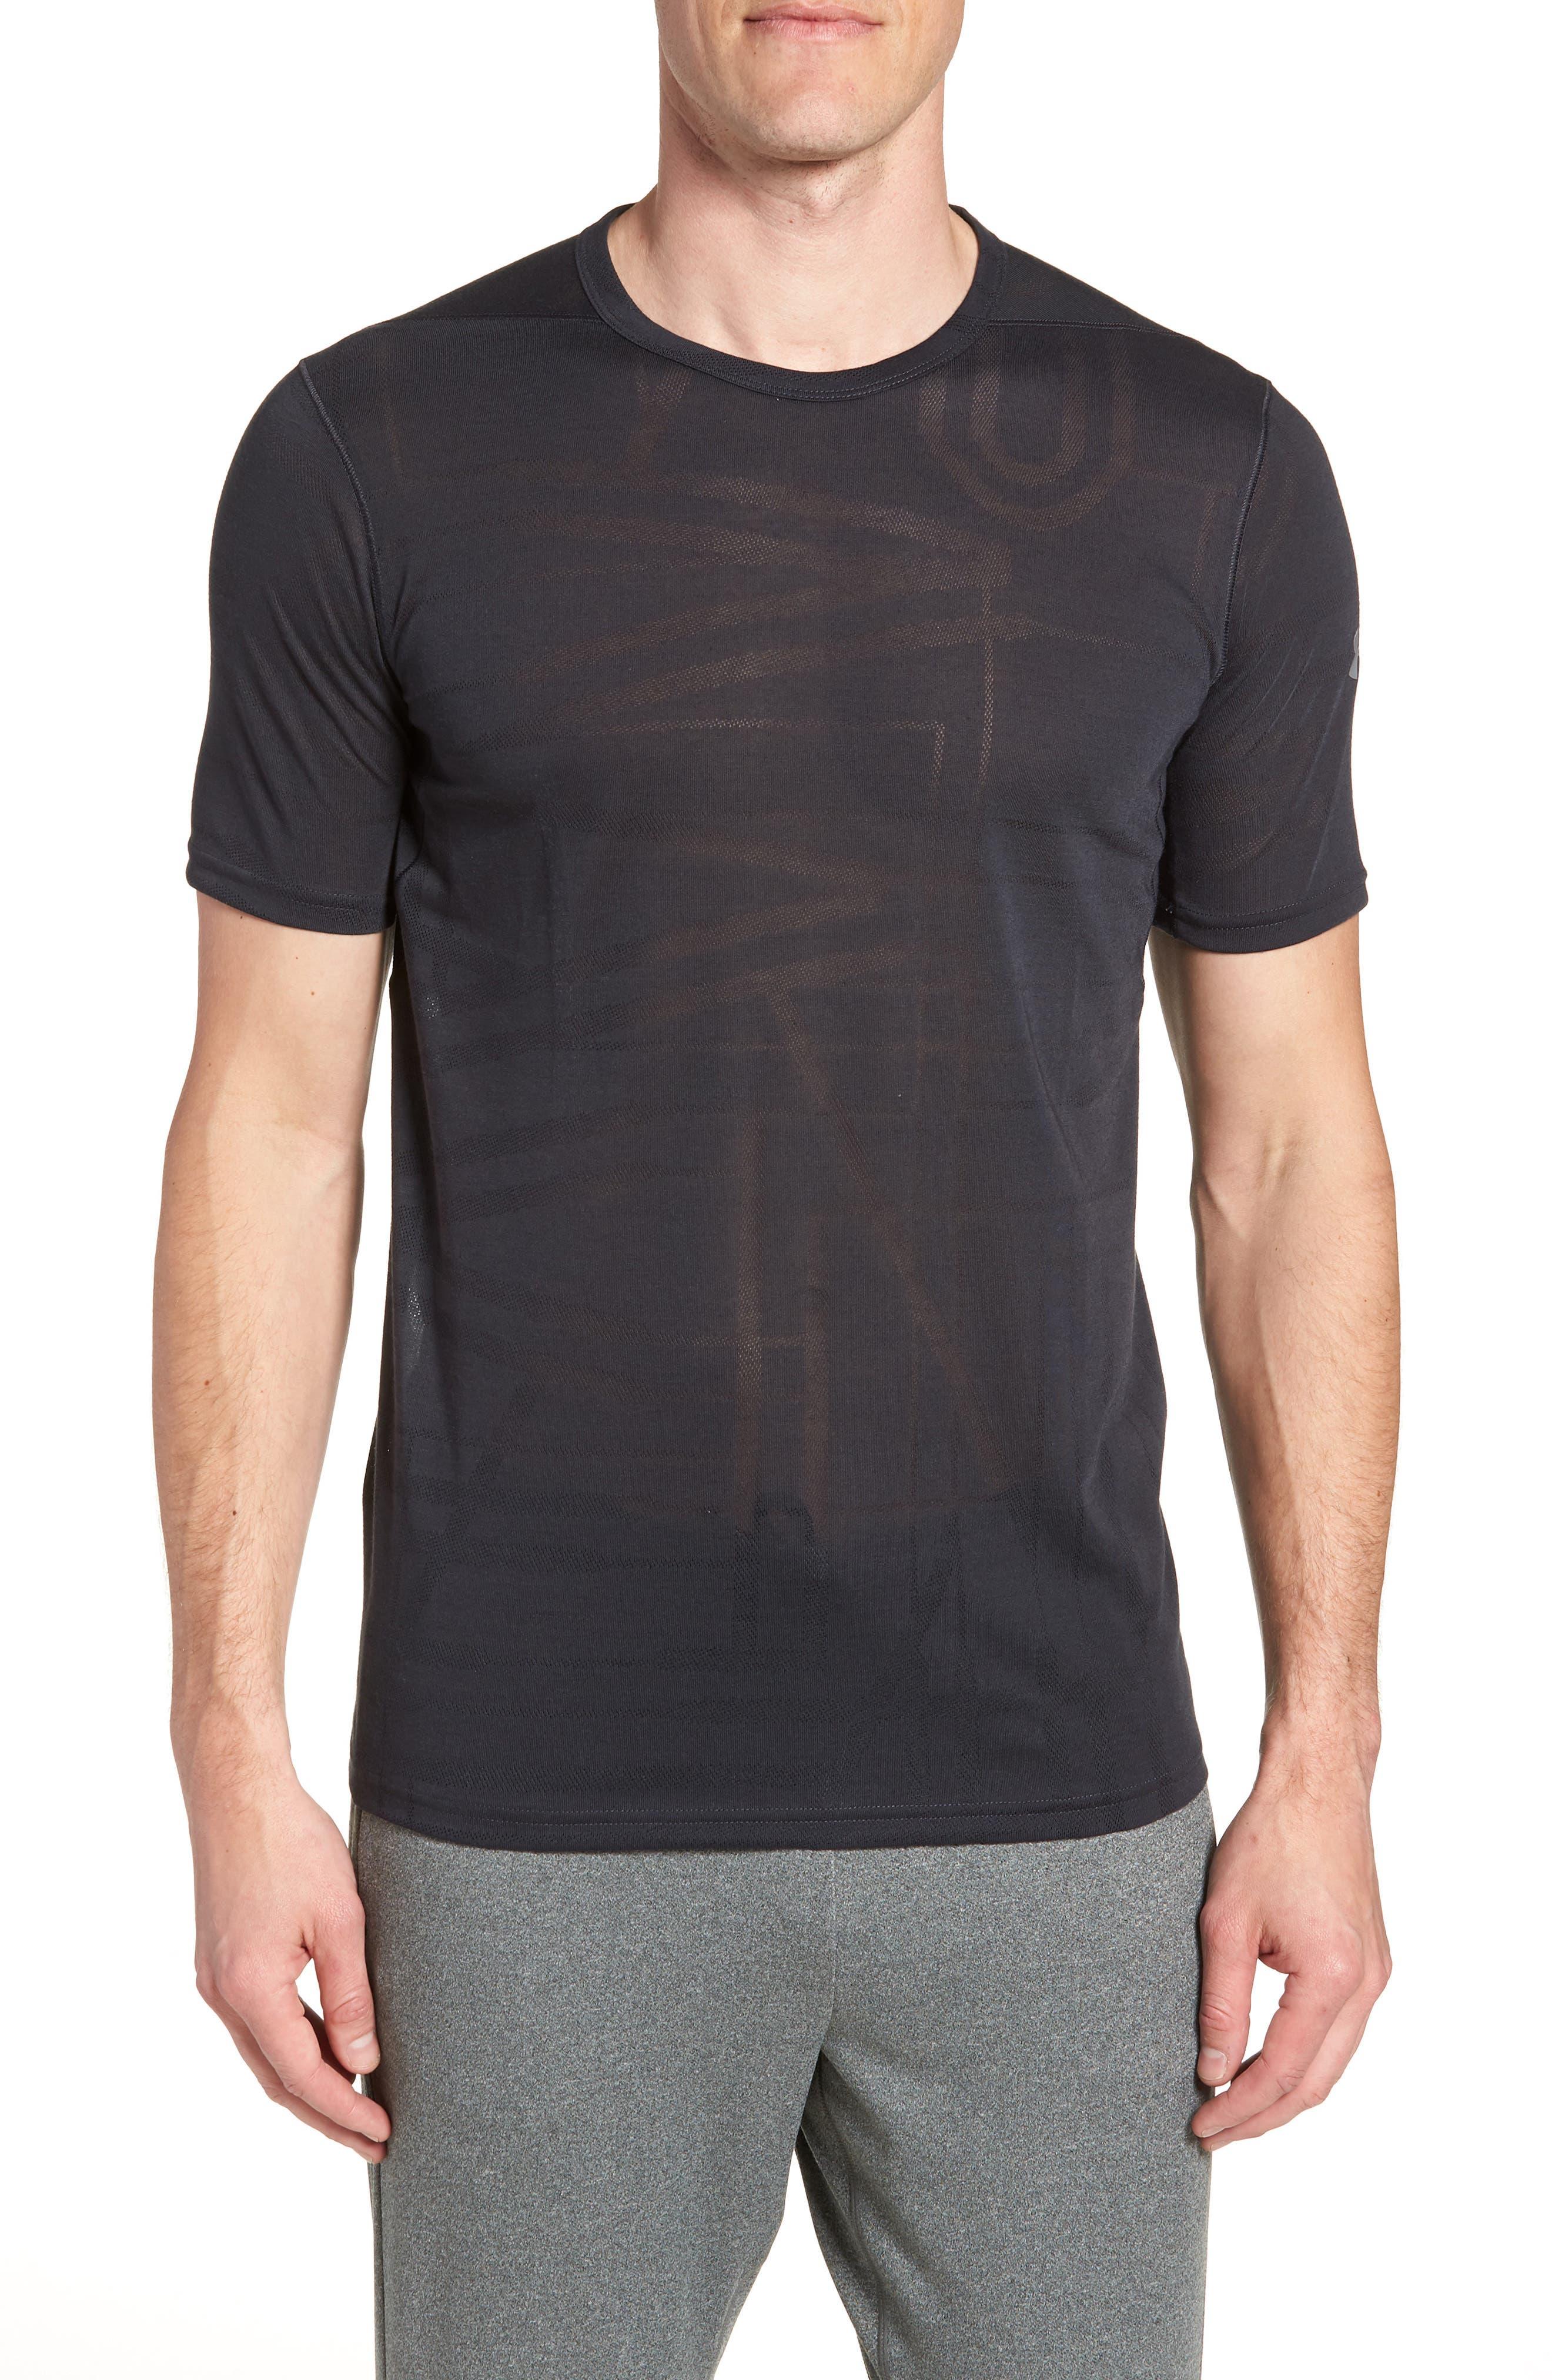 Threadborne Elite Crewneck T-Shirt,                         Main,                         color, Black/ Graphite